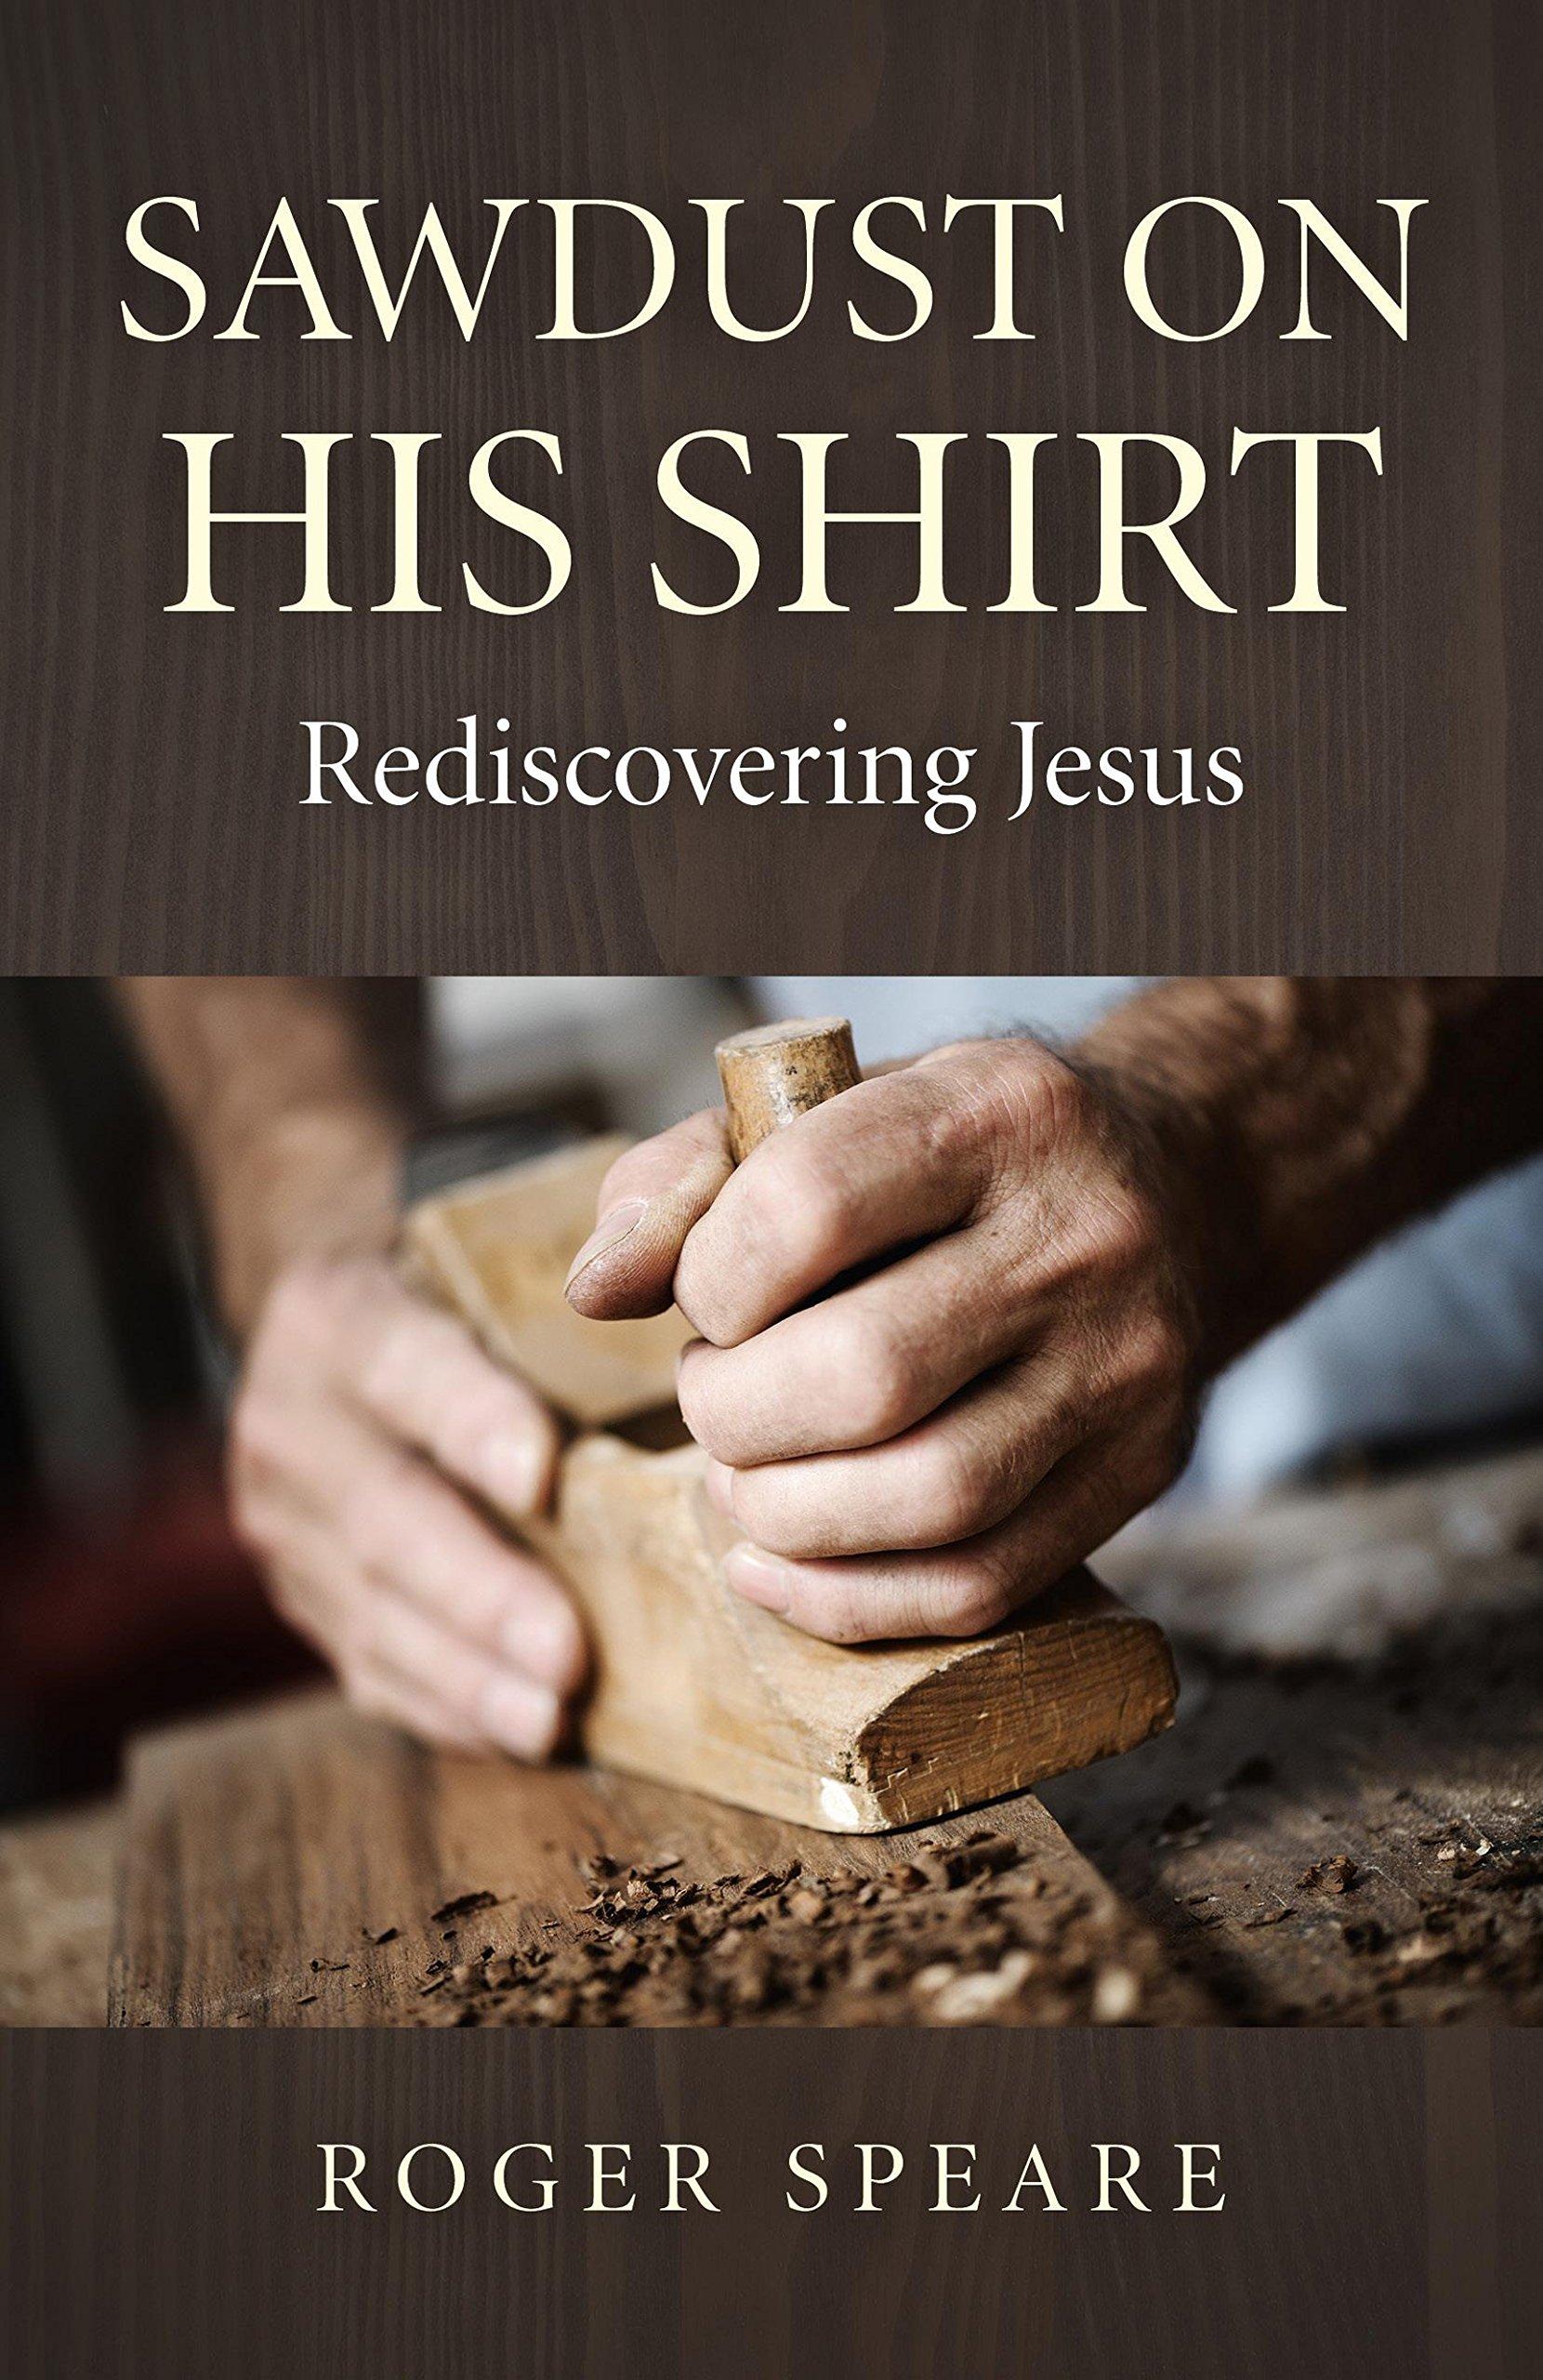 Download Sawdust on His Shirt: Rediscovering Jesus pdf epub